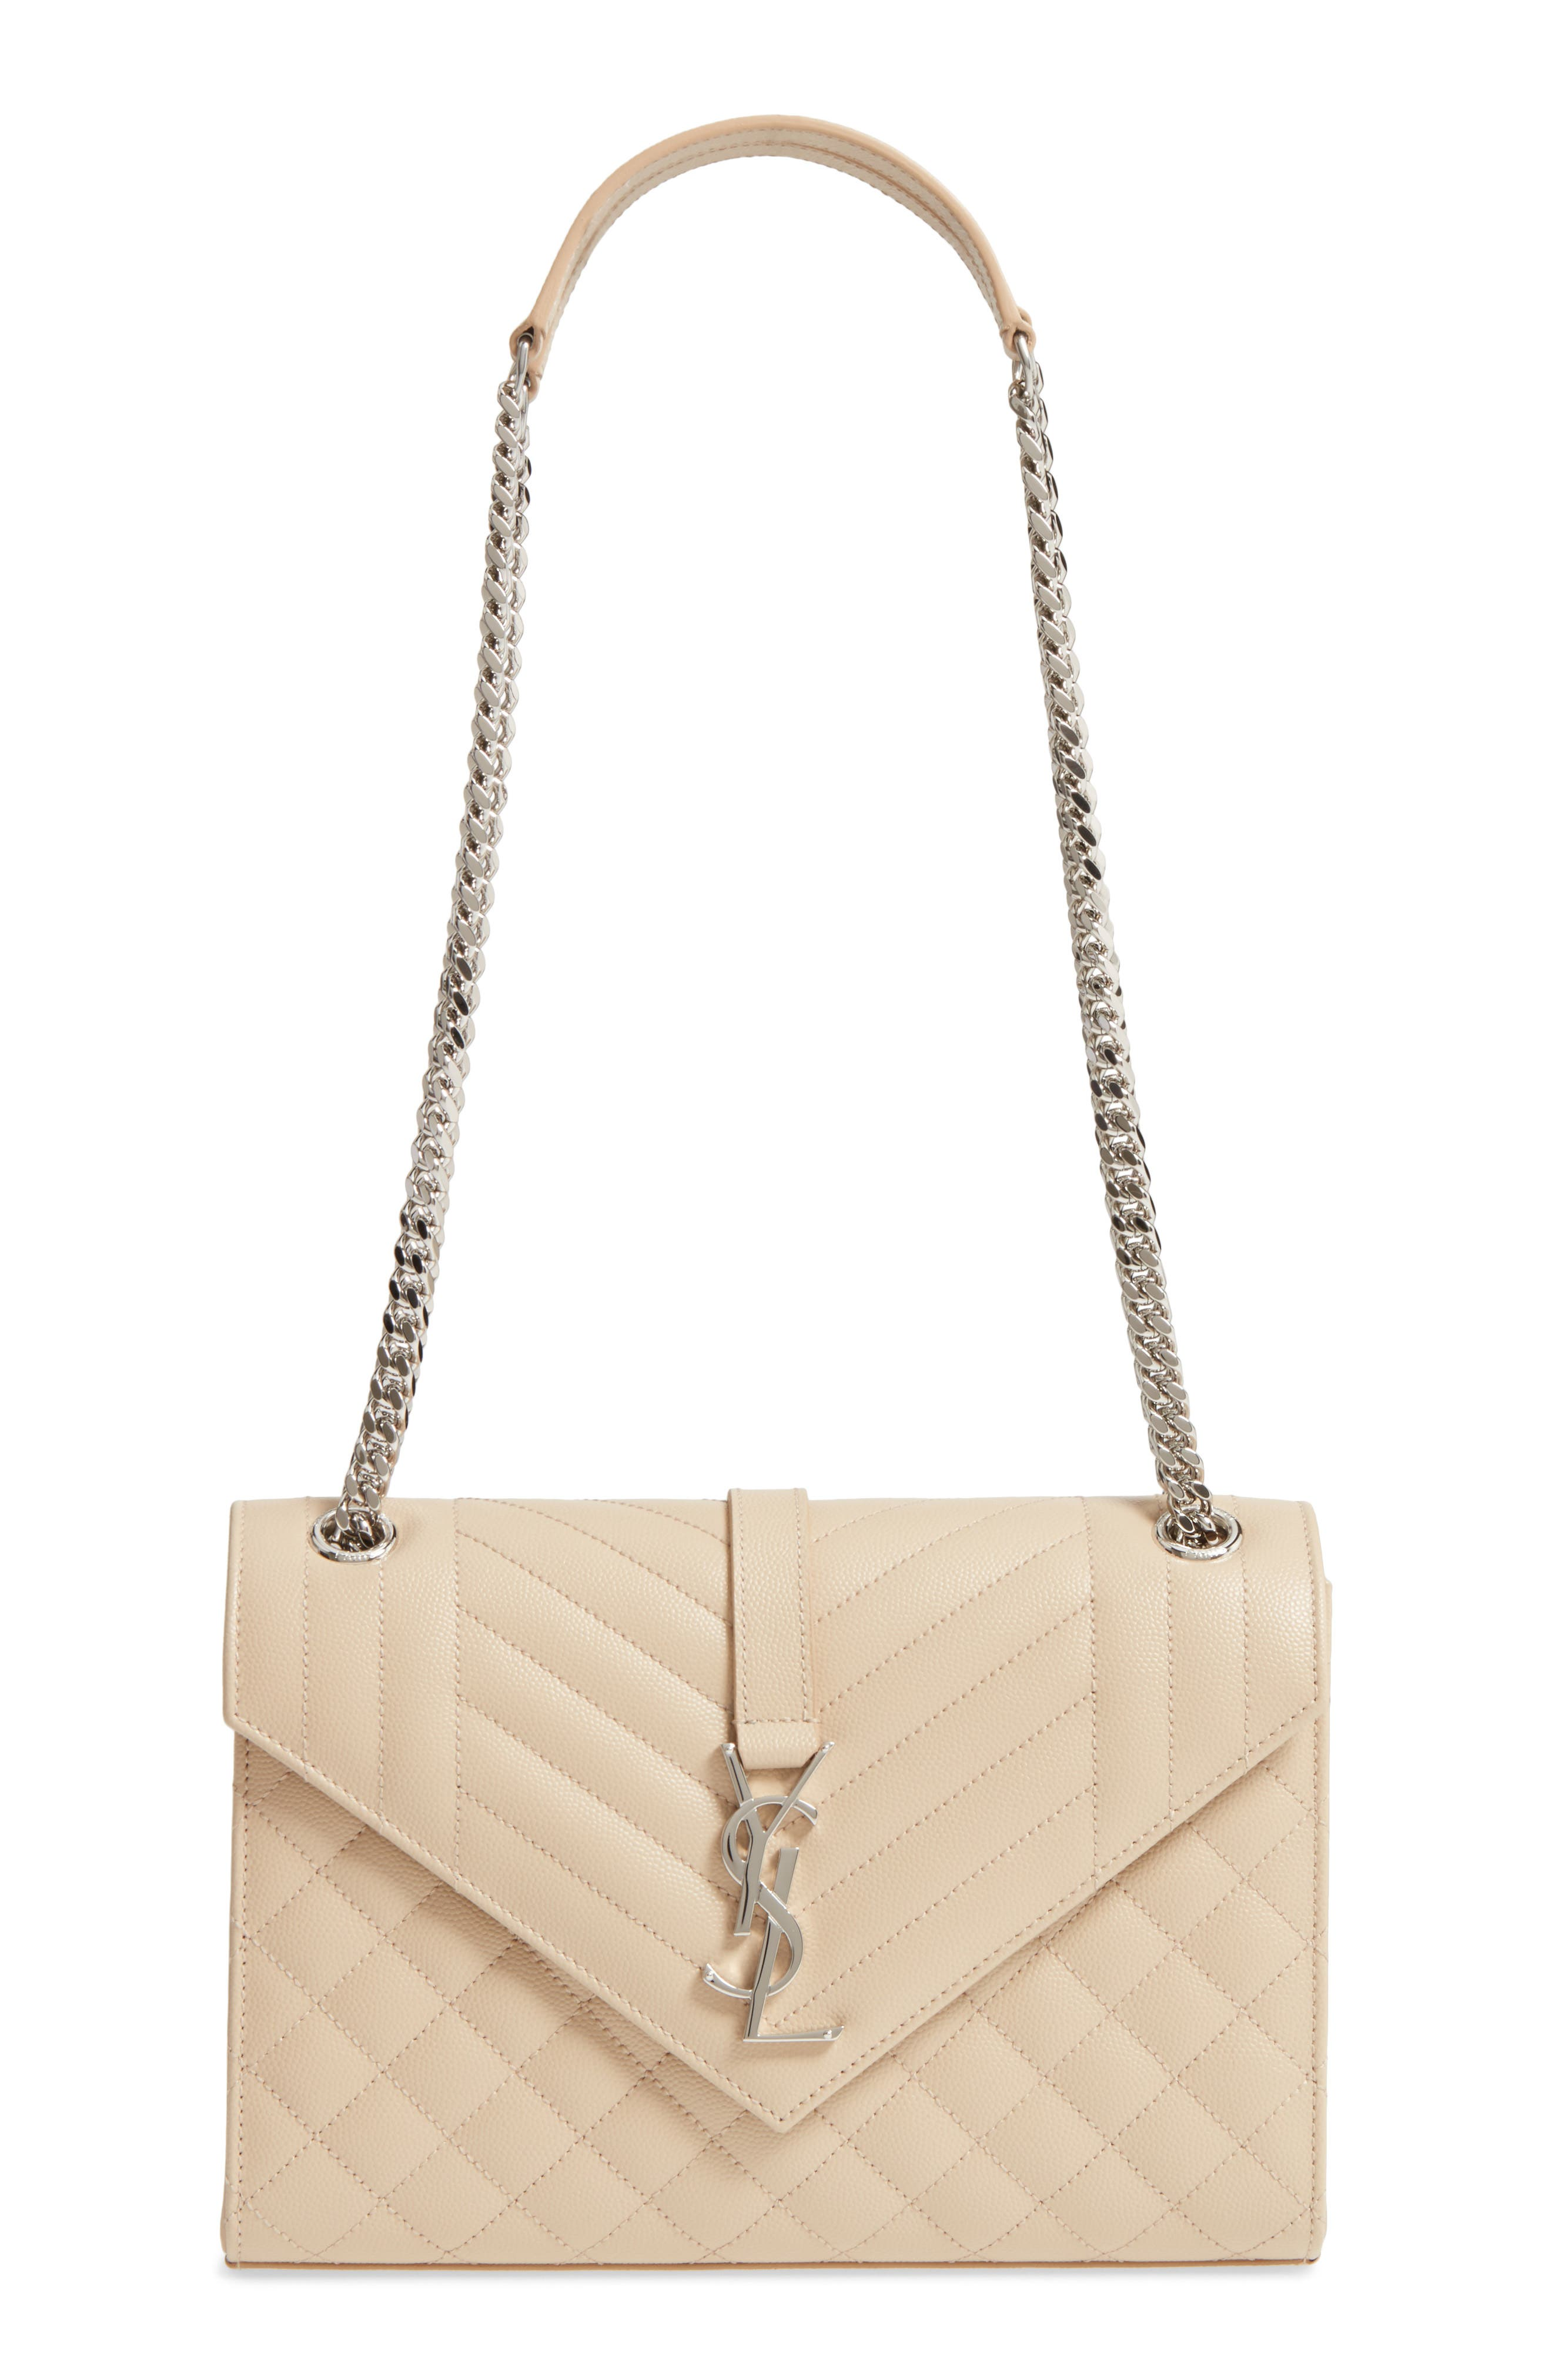 Medium Cassandra Calfskin Shoulder Bag,                         Main,                         color, POUDRE